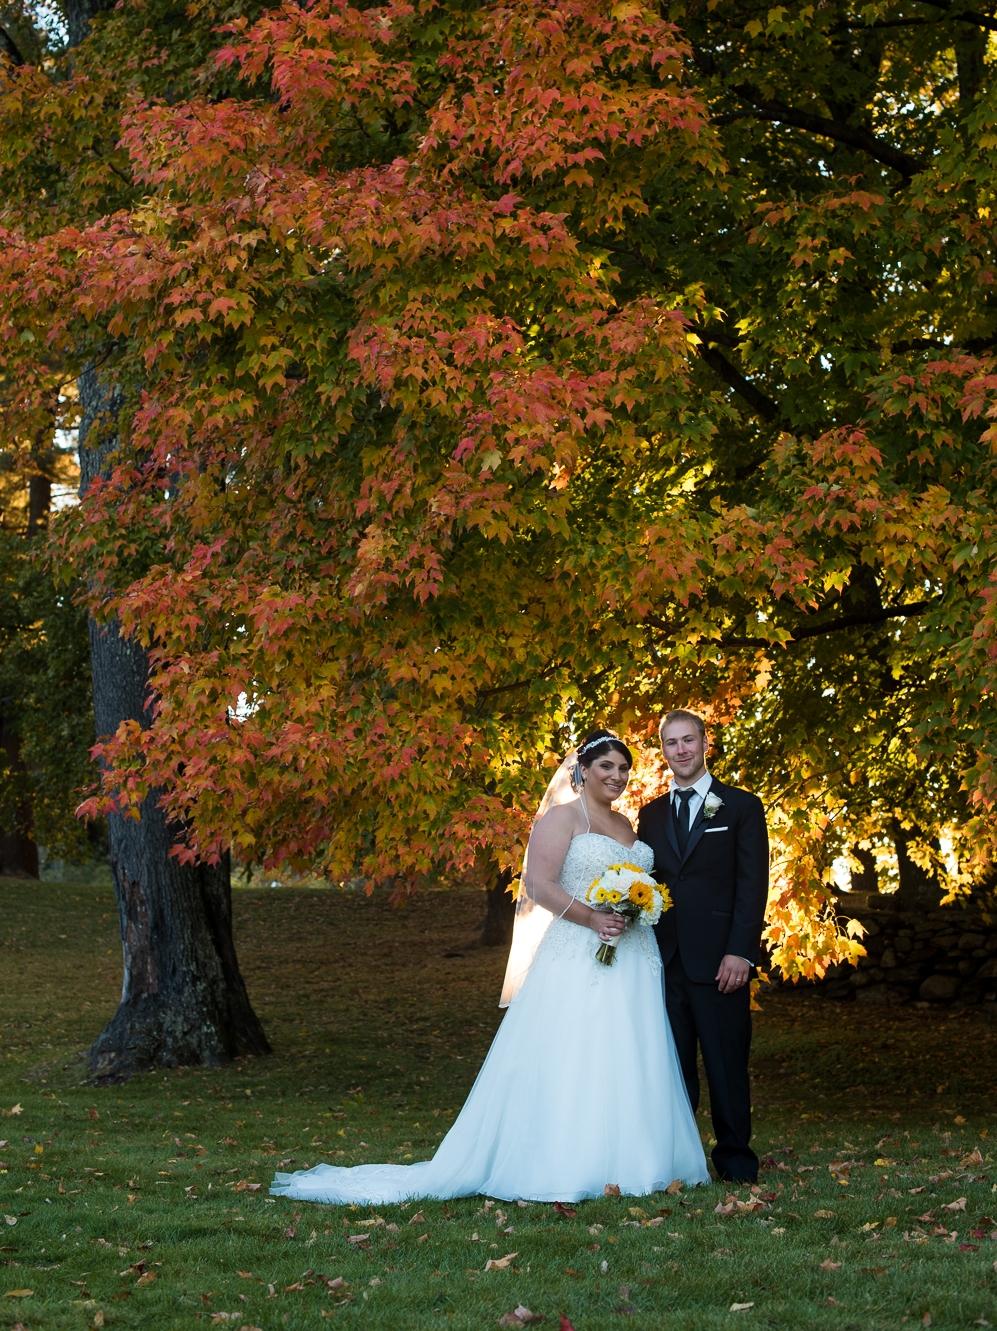 Kara Emily Krantz Photography, MA outdoor wedding photographer